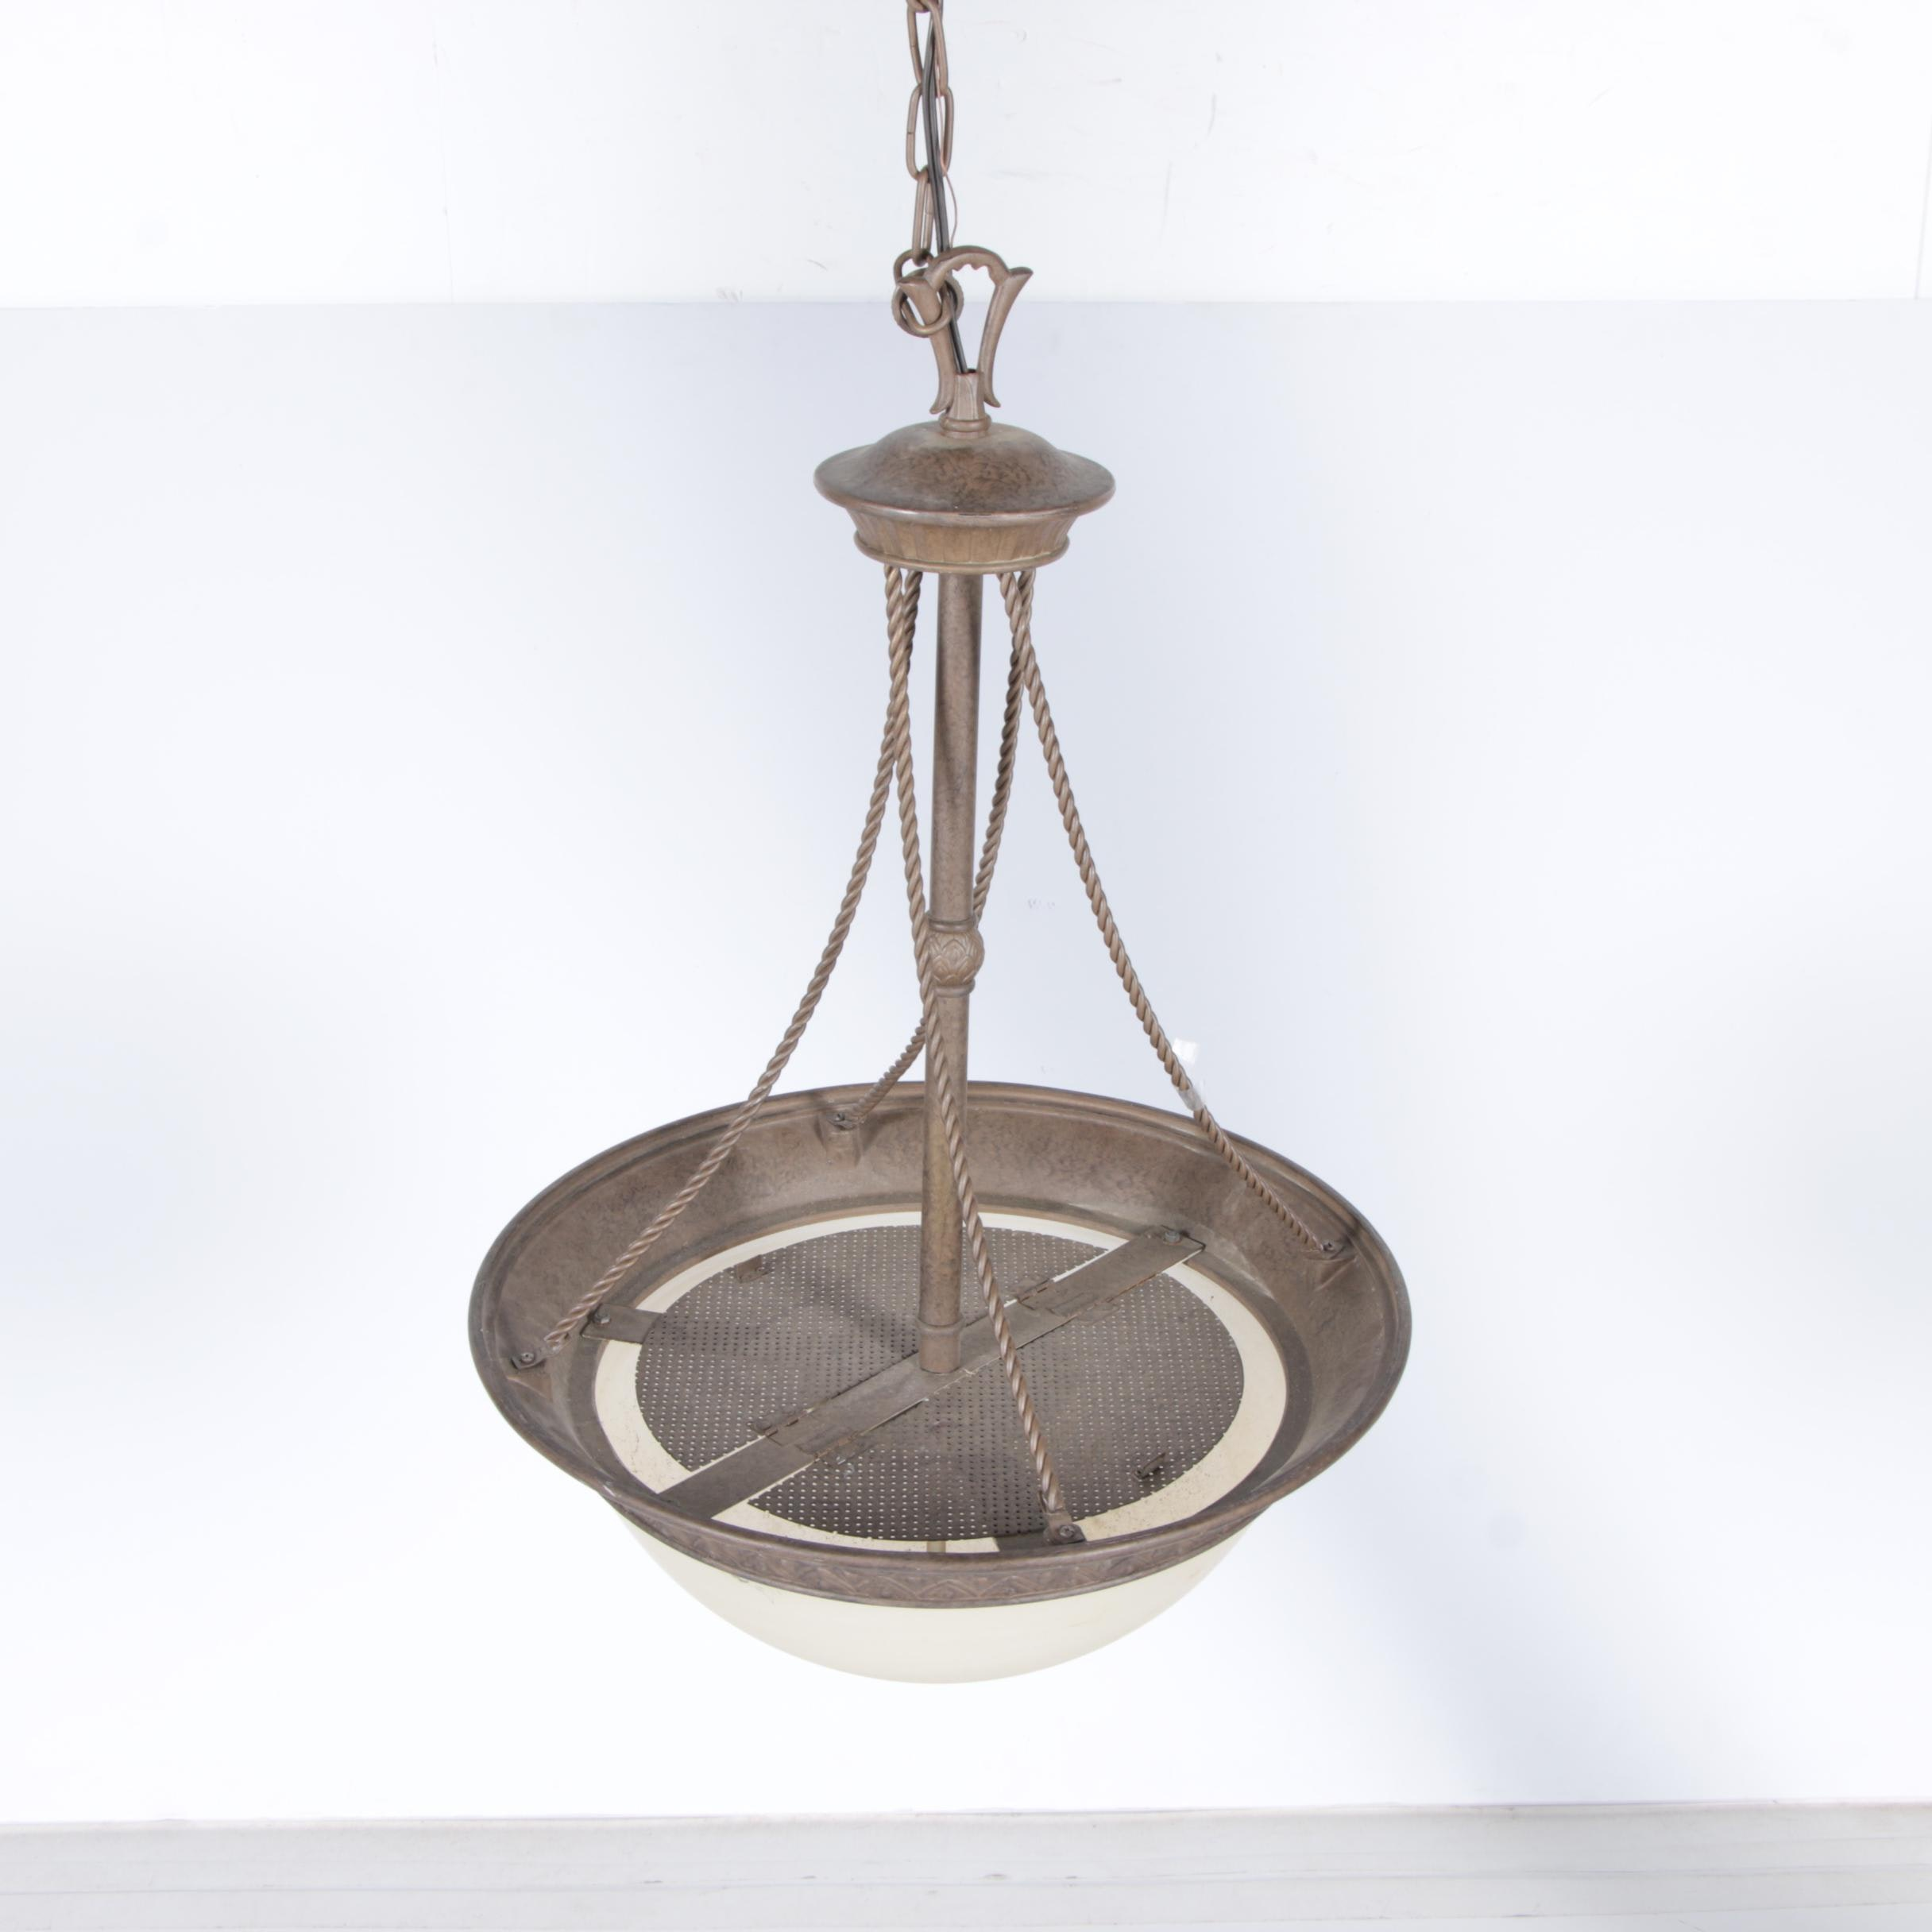 Pendant Ceiling Light Fixture